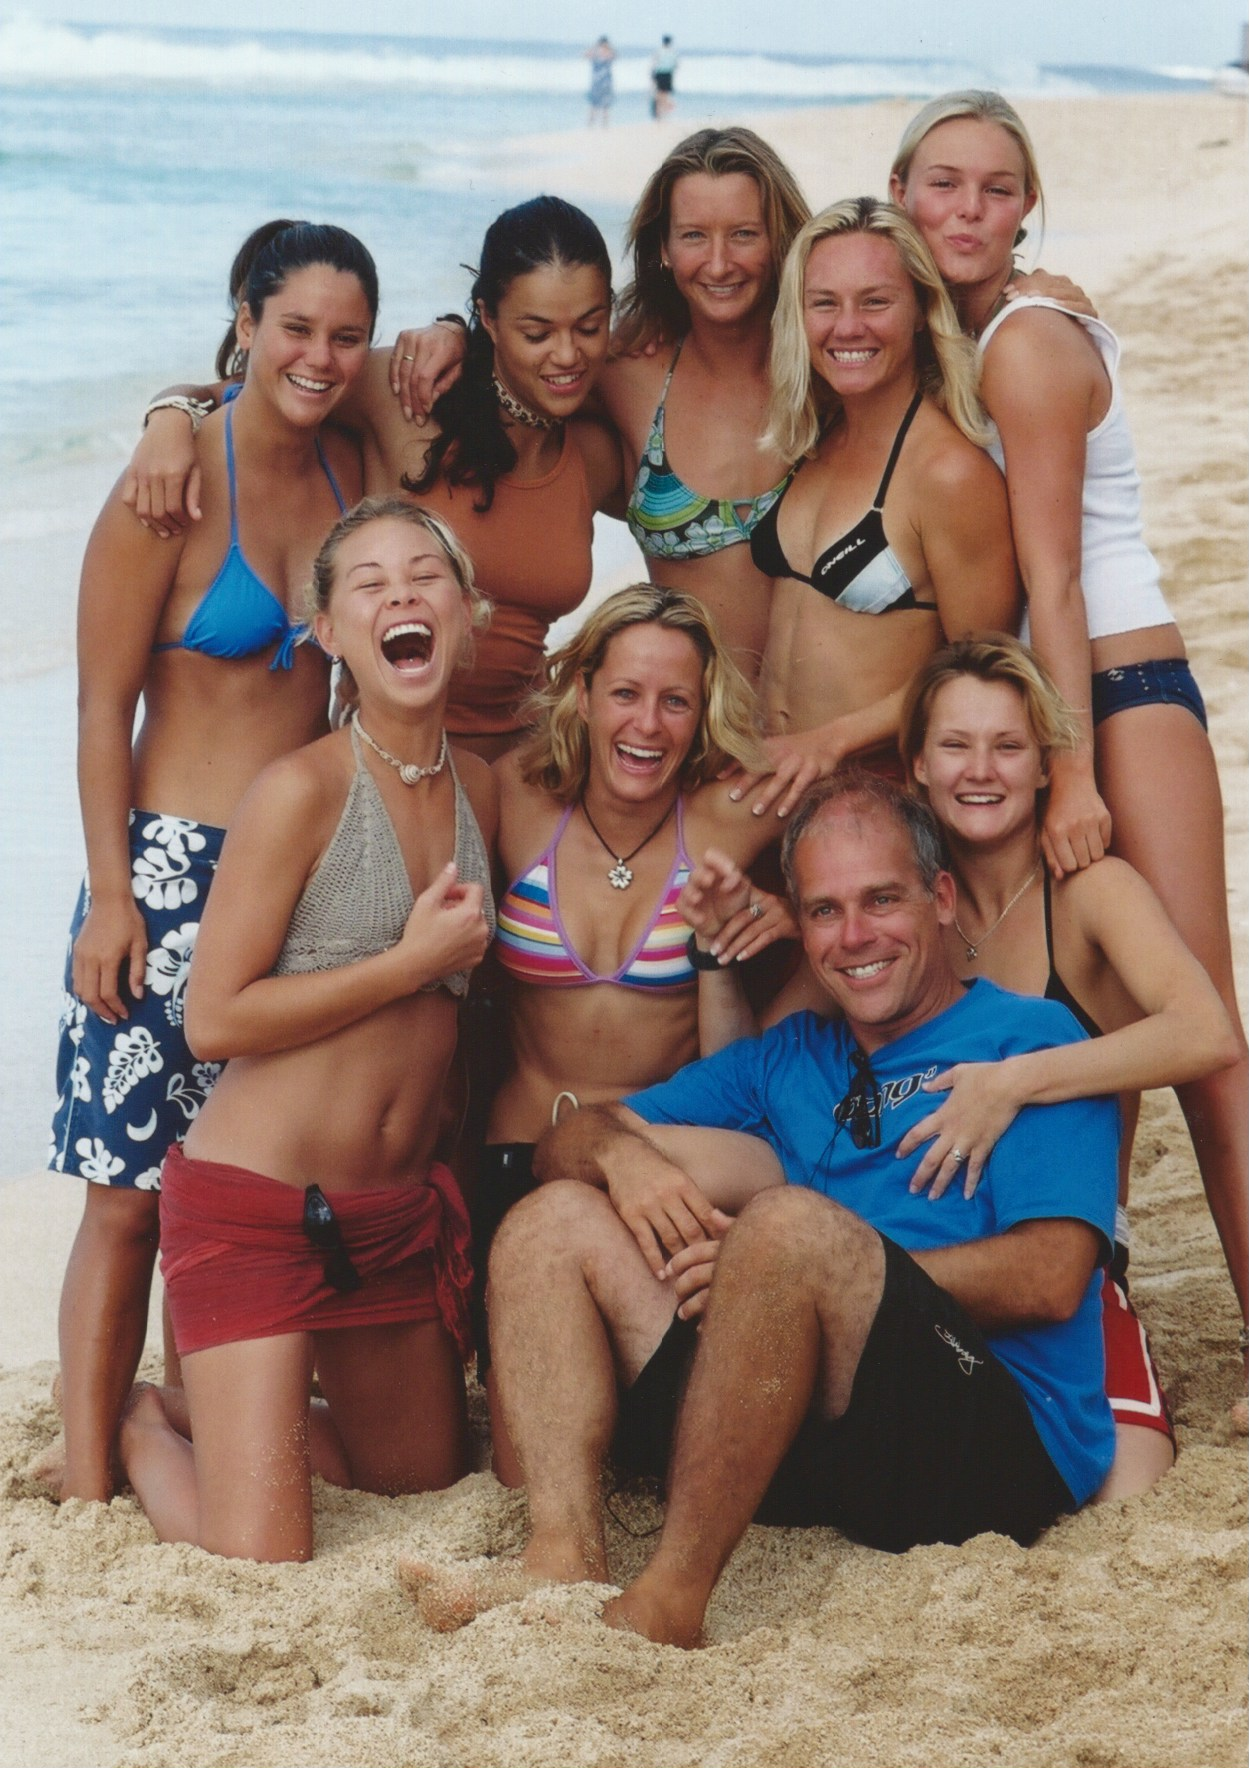 Blue Crush, North Shore Oahu  Top : Megan Abudo, Michelle Rodriguez, Layne Beachley, Rochelle Ballard, Kate Bosworth.  Bottom :Sanoe Lake, Kate Skarratt,  Rick Dallago, Keala Kennely,